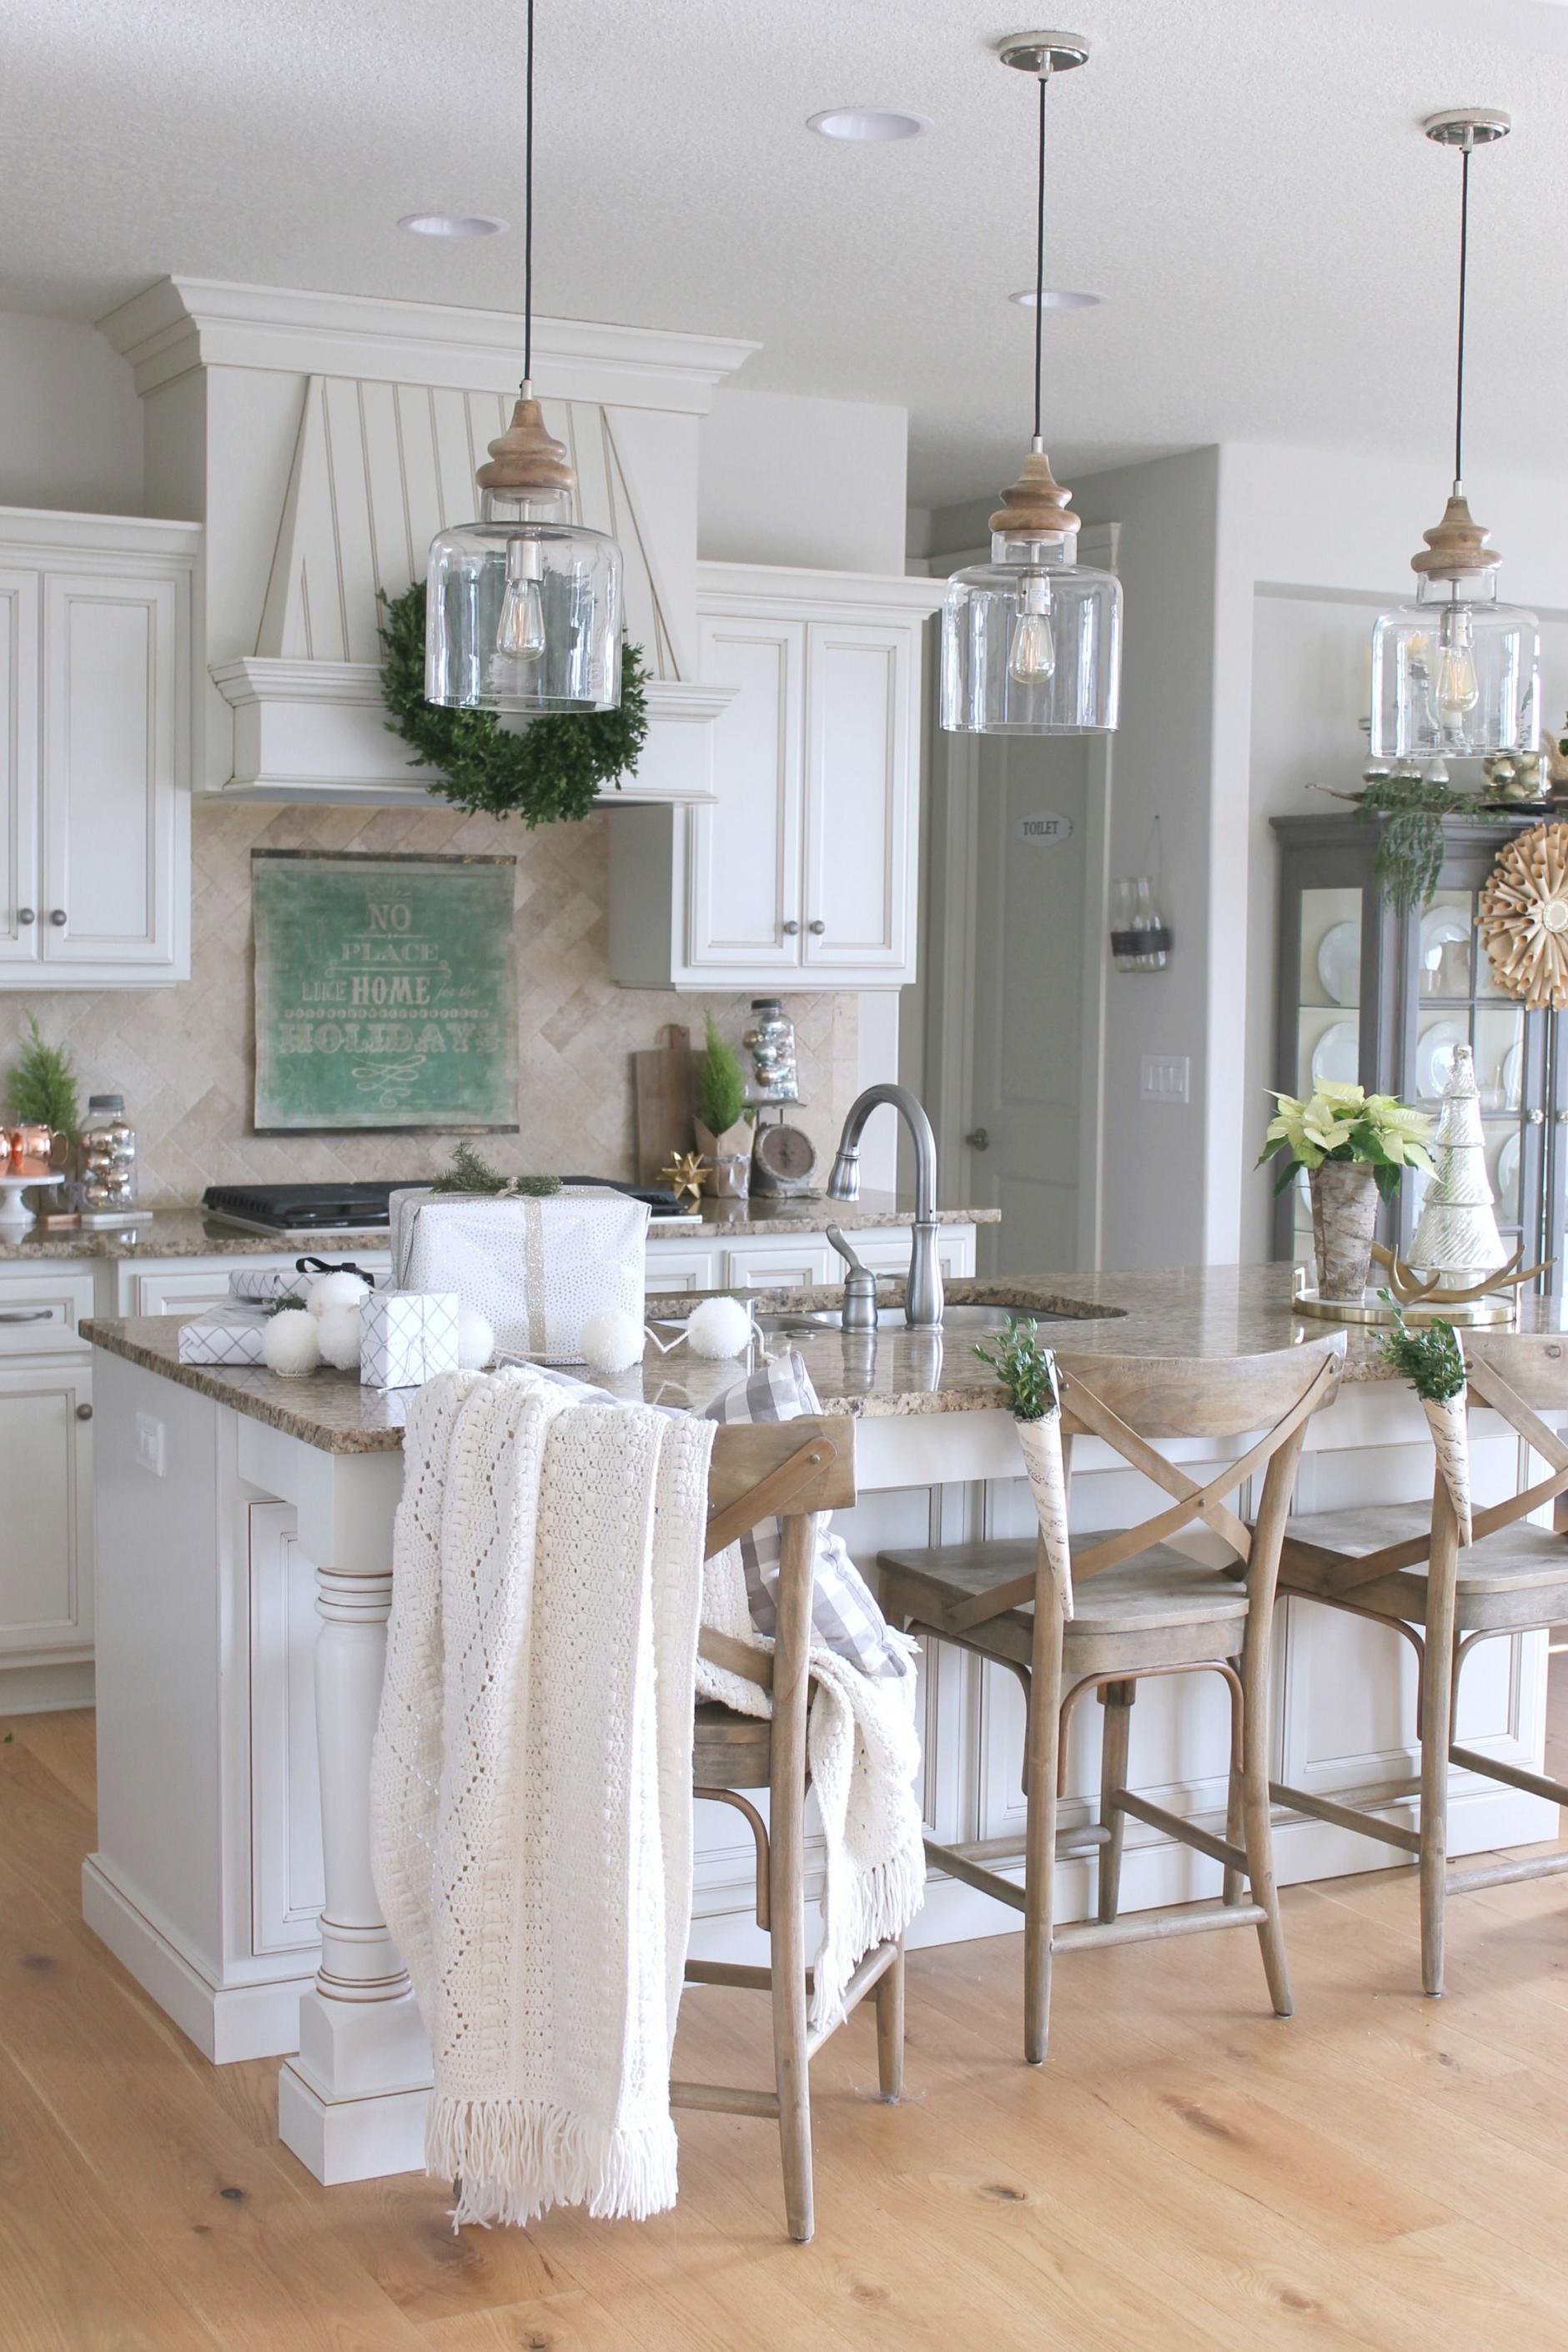 New Farmhouse Style Island Pendant Lights | Kitchens | Pinterest within Best  Pendant Lights For Kitchen